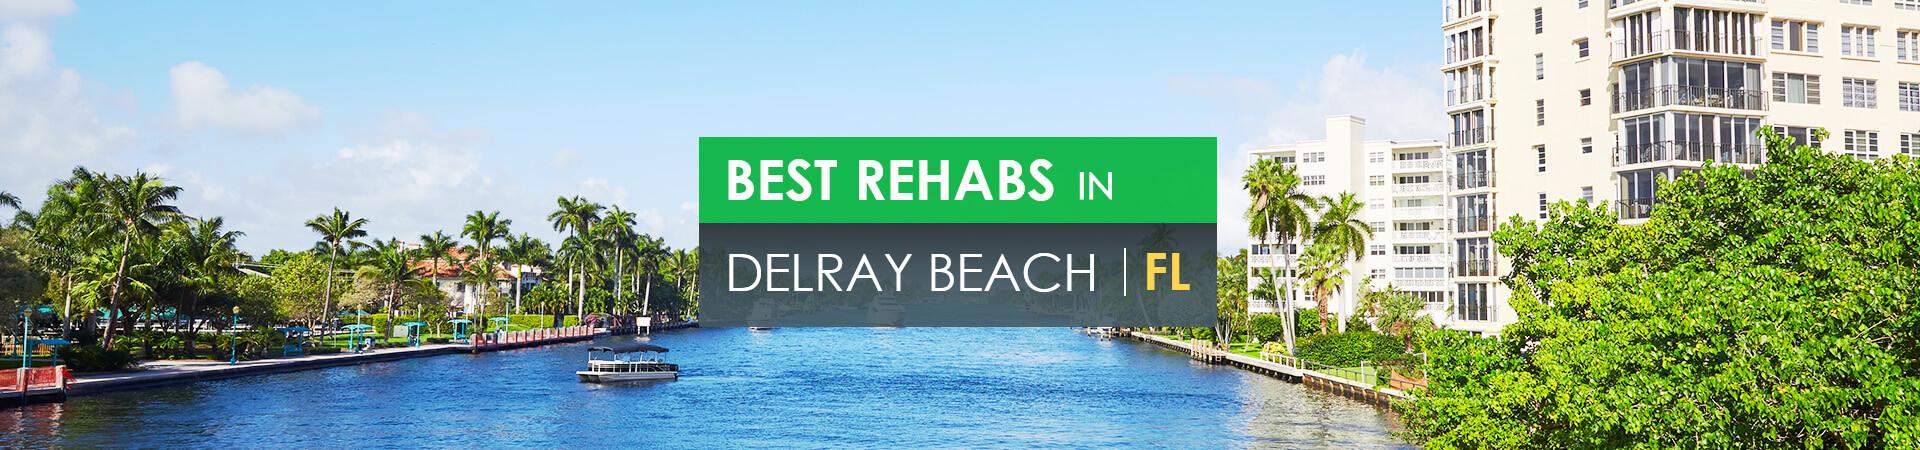 Best rehabs in Delray Beach, FL